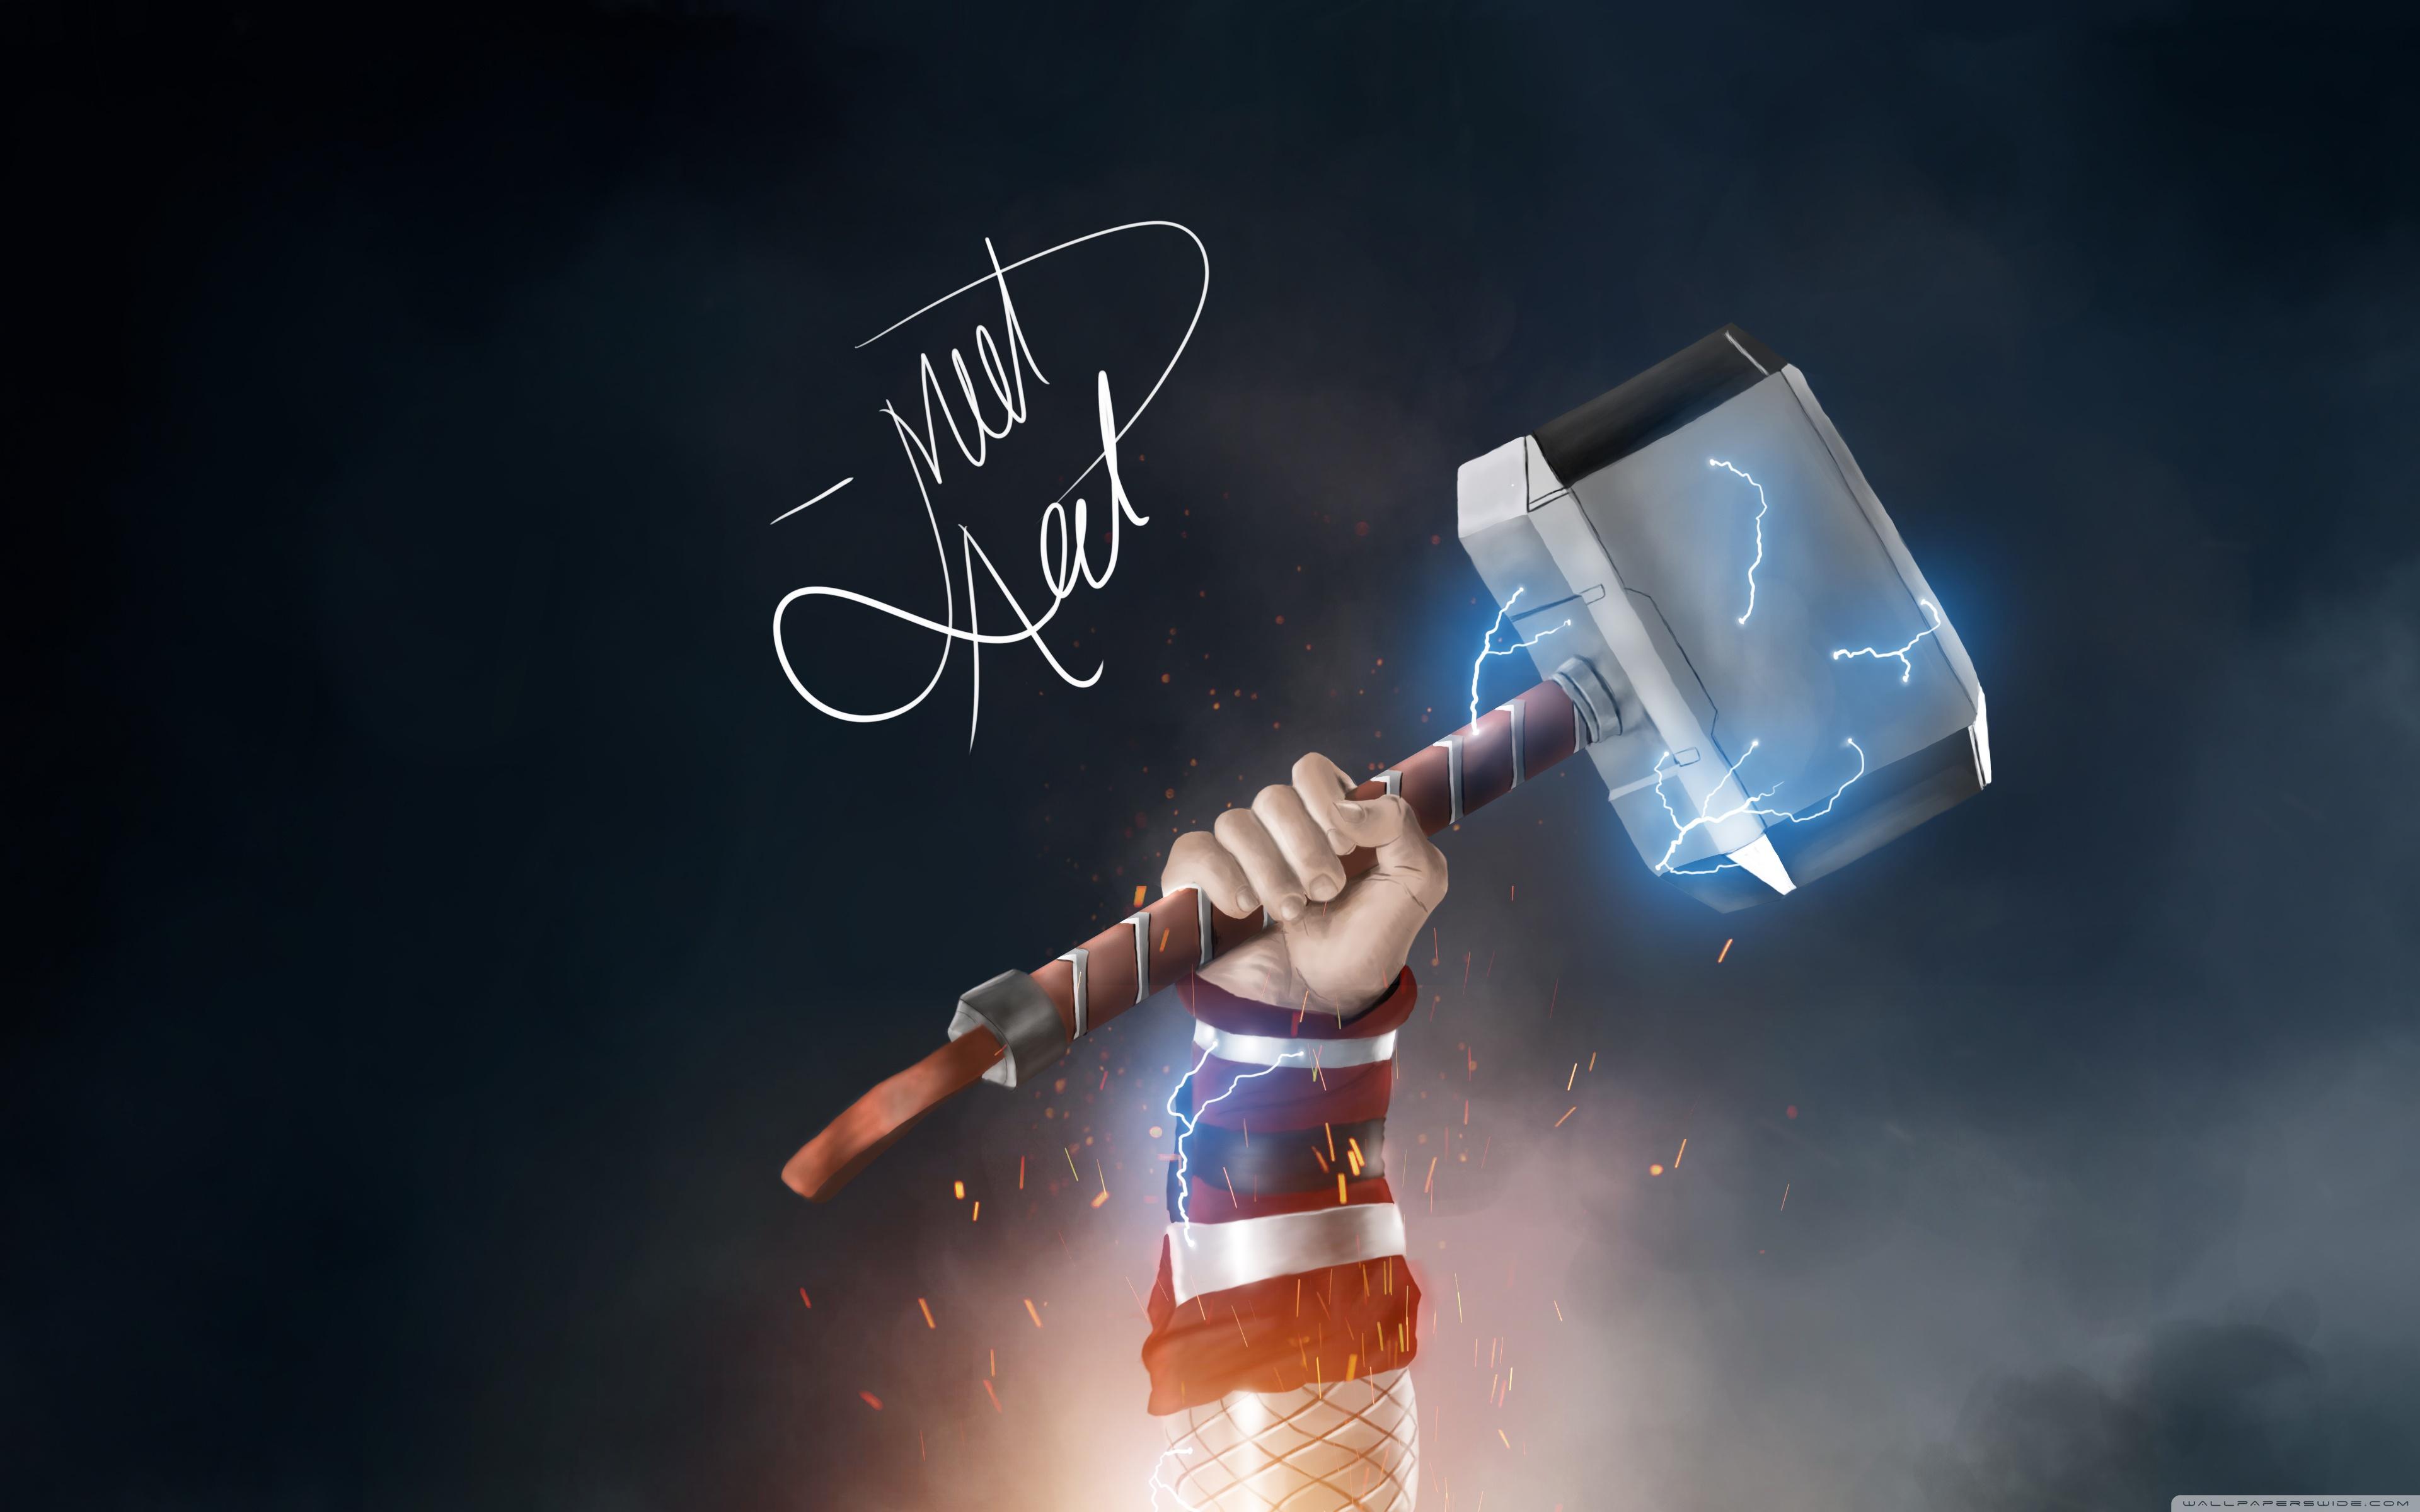 Thor Hammer Wallpaper Hd 3840x2400 Wallpaper Teahub Io